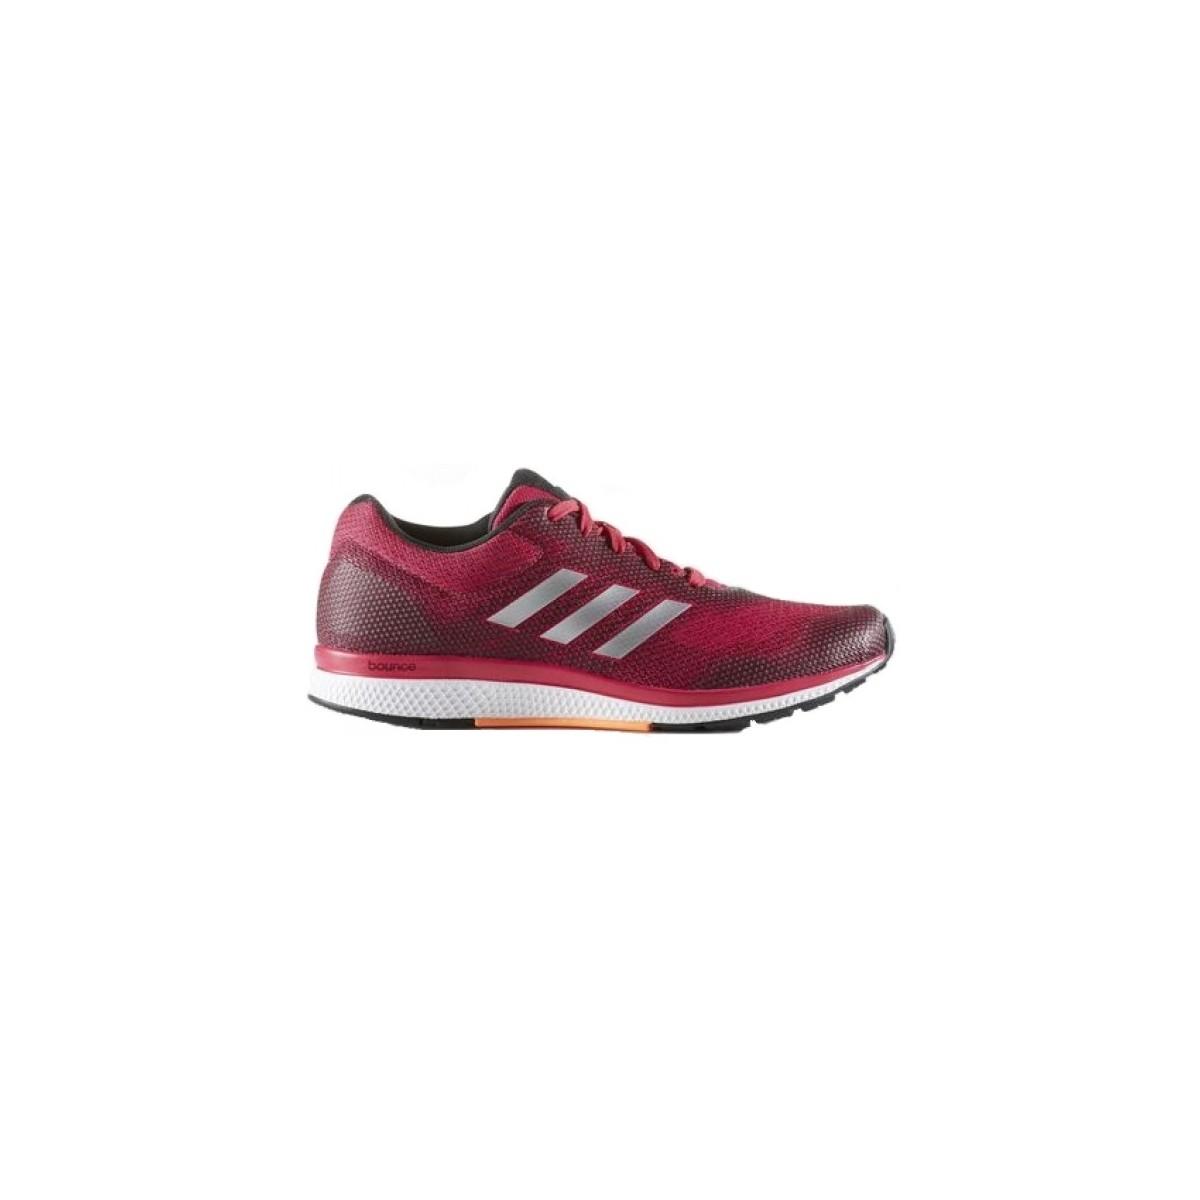 adidas bounce femme,Chaussures Adidas Femme Mana Bounce 2